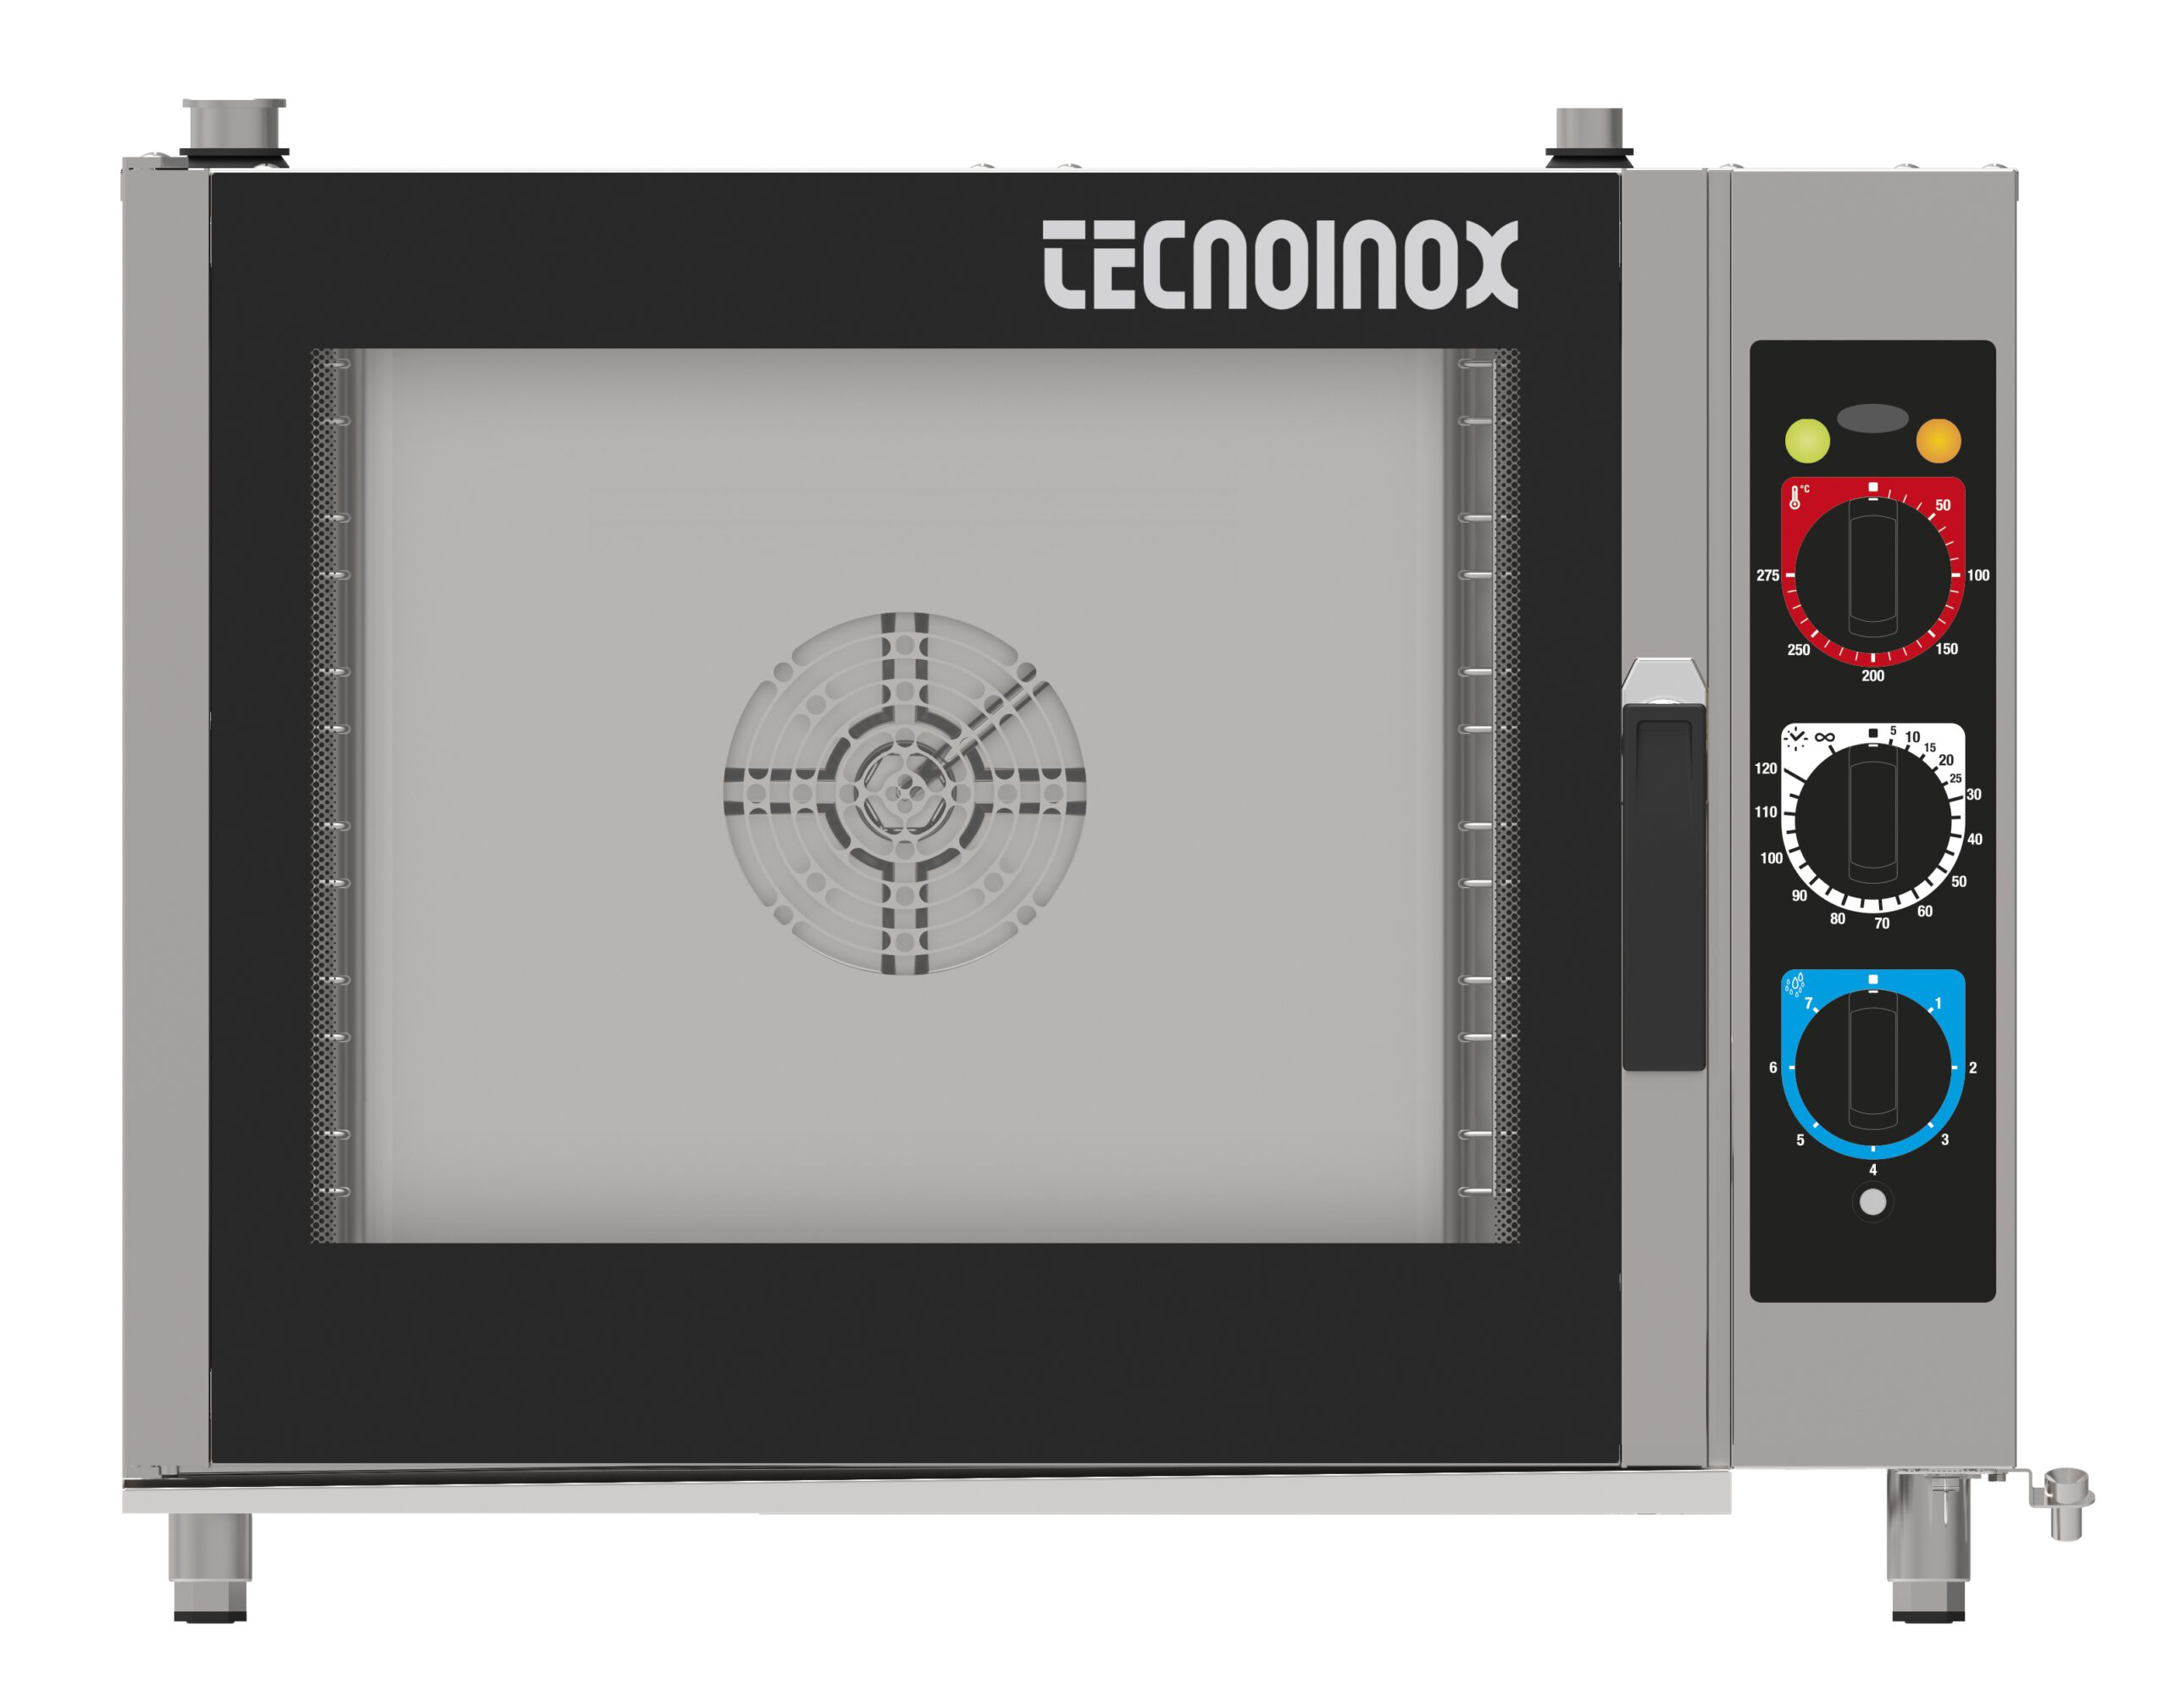 Industriovn 6 stik med damp , Tecnocombi manuel  - en kvalitetsovn fra italienske Tecnoinox